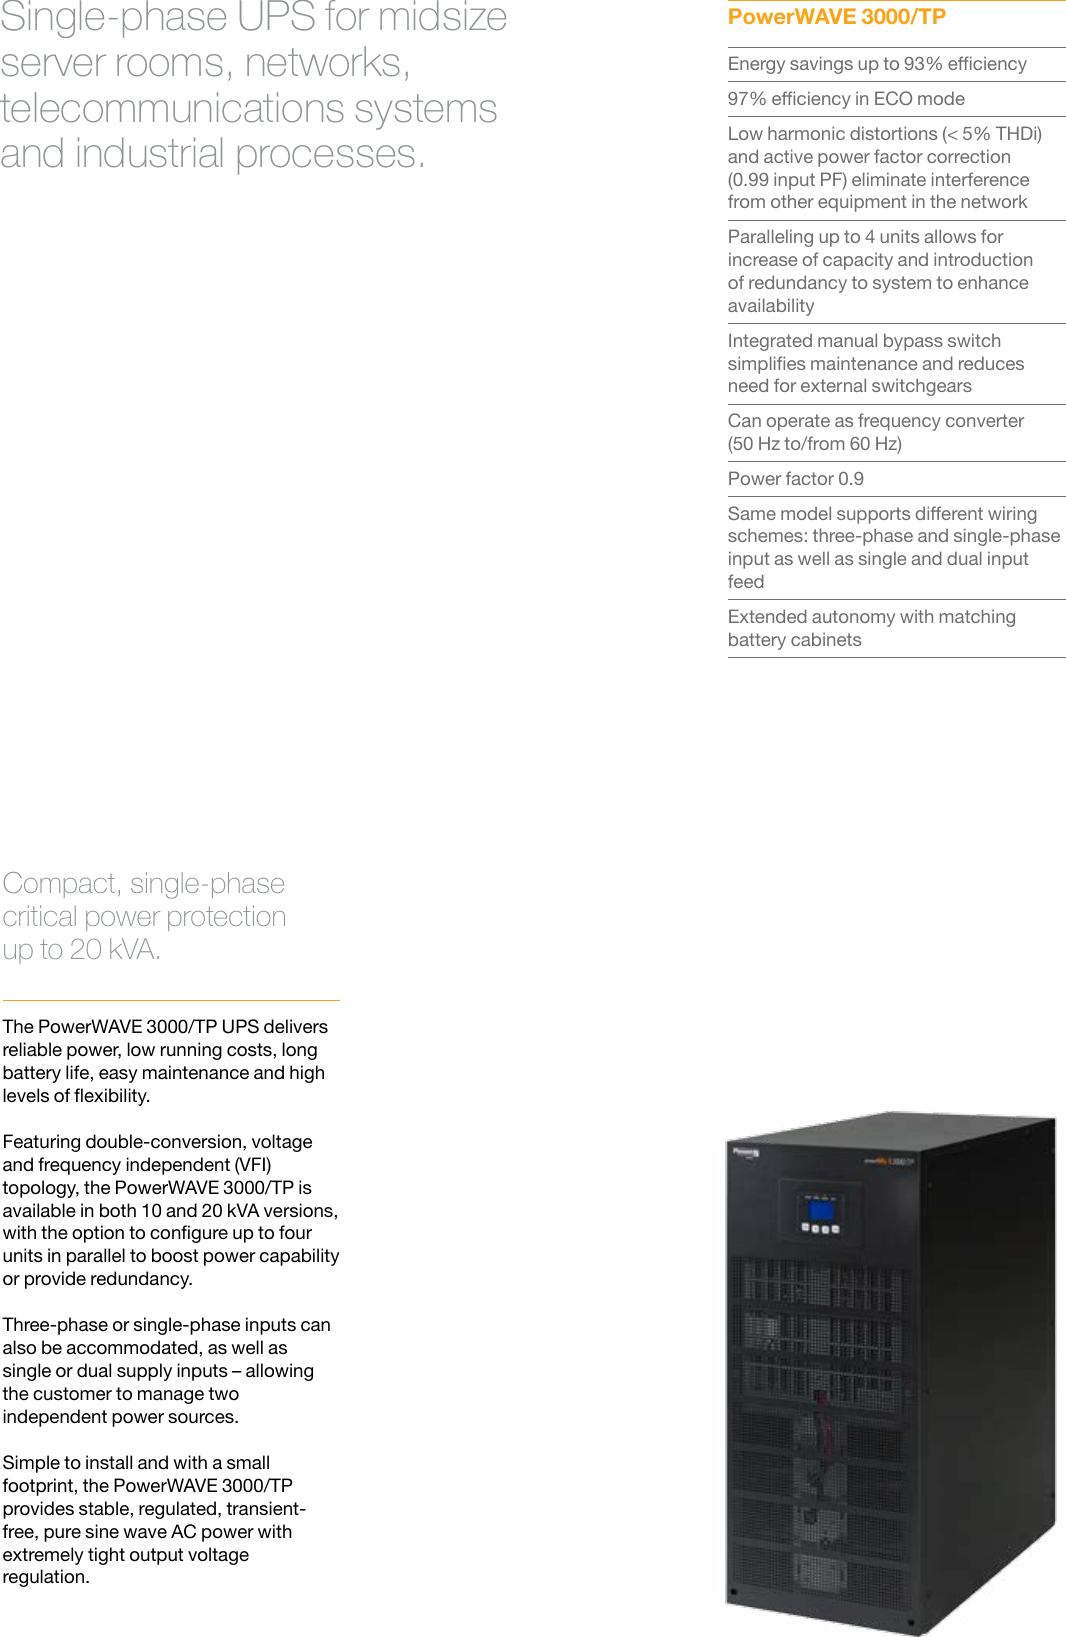 UPS Power WAVE 3000TP